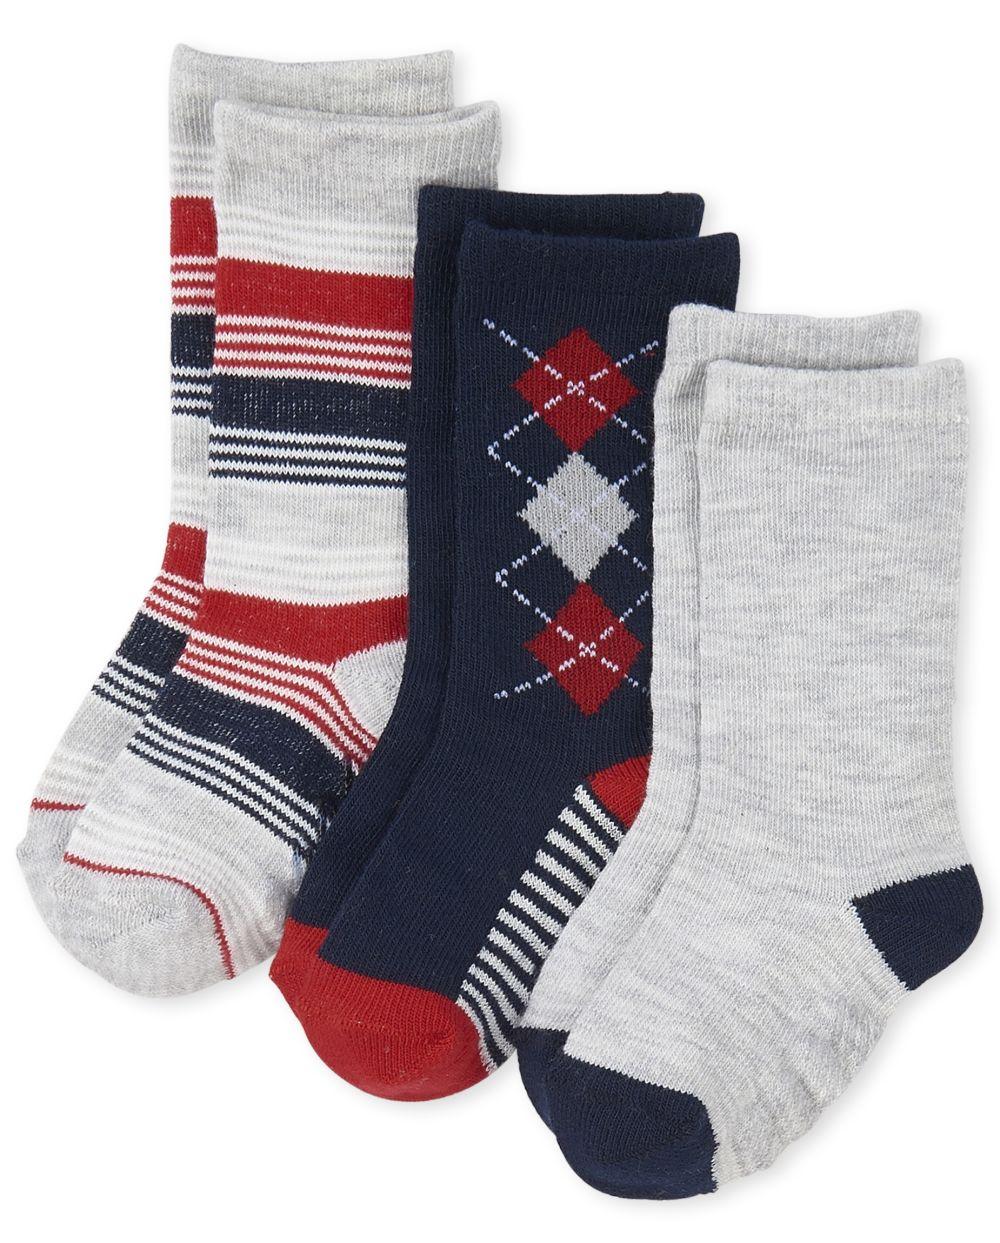 Toddler Boys Uniform Argyle Crew Socks 3-Pack